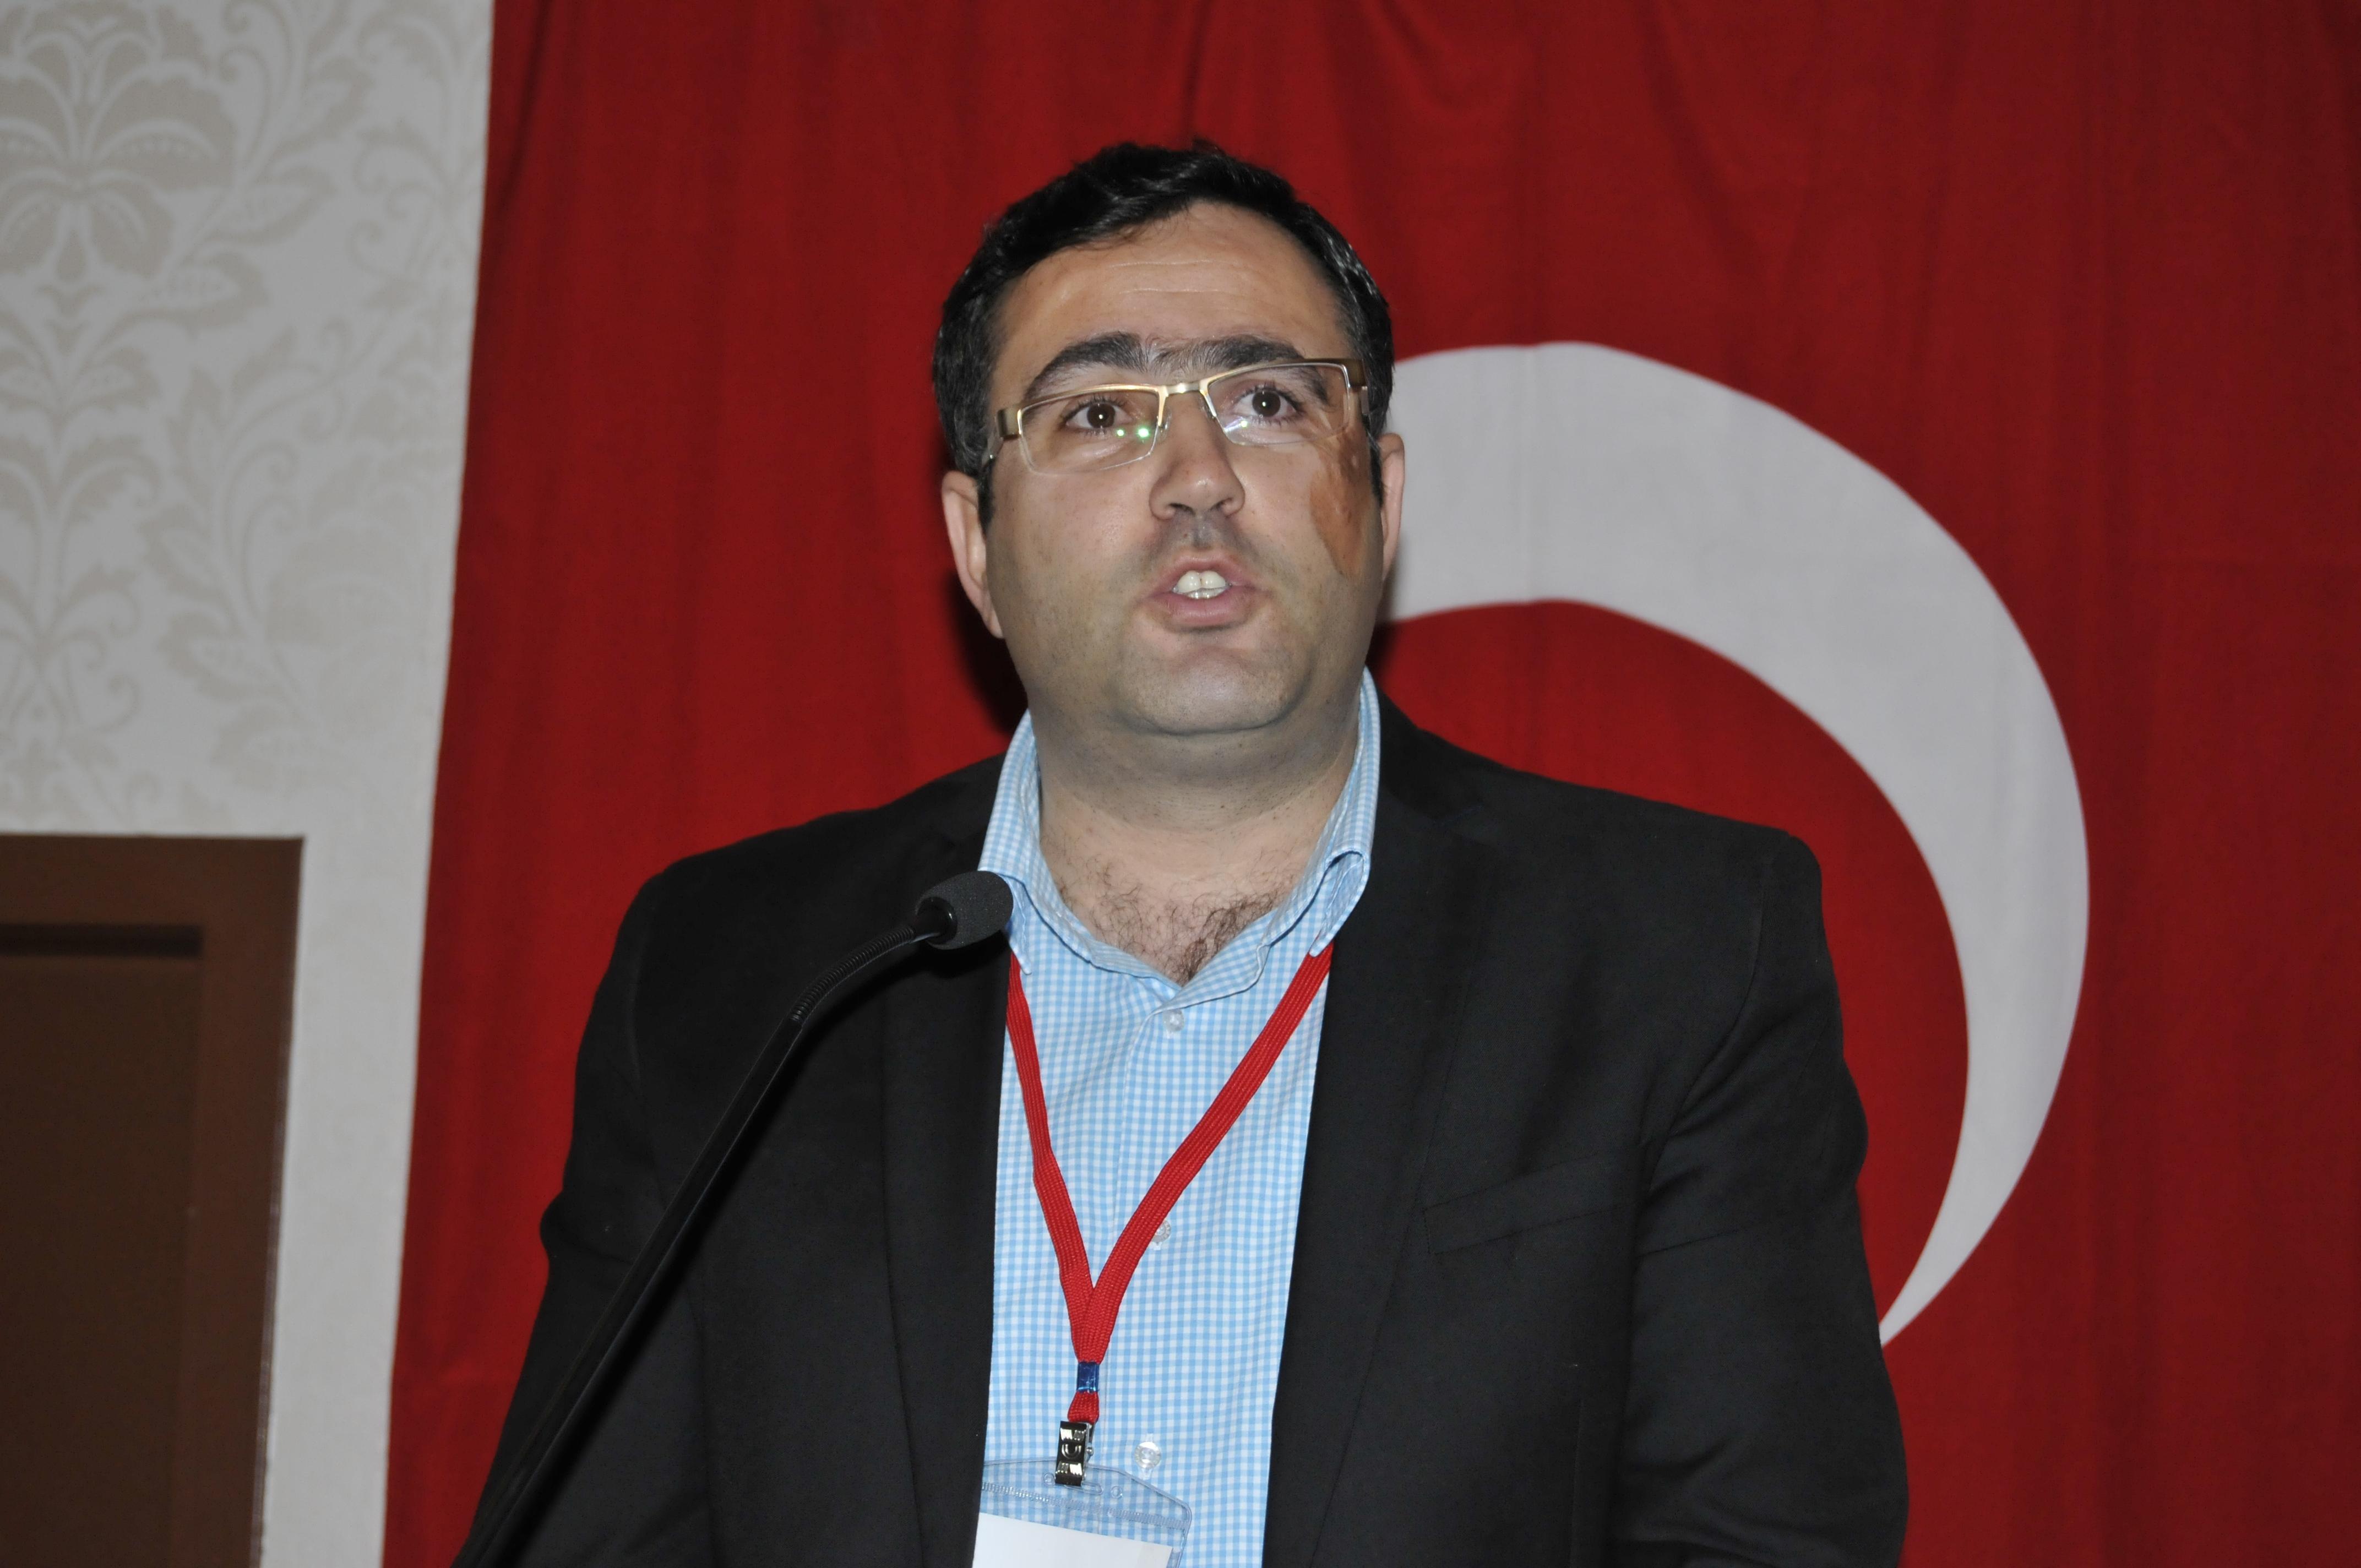 1 Mayıs'ta, 1 Mayıs Taksim Alanı'ndayız'